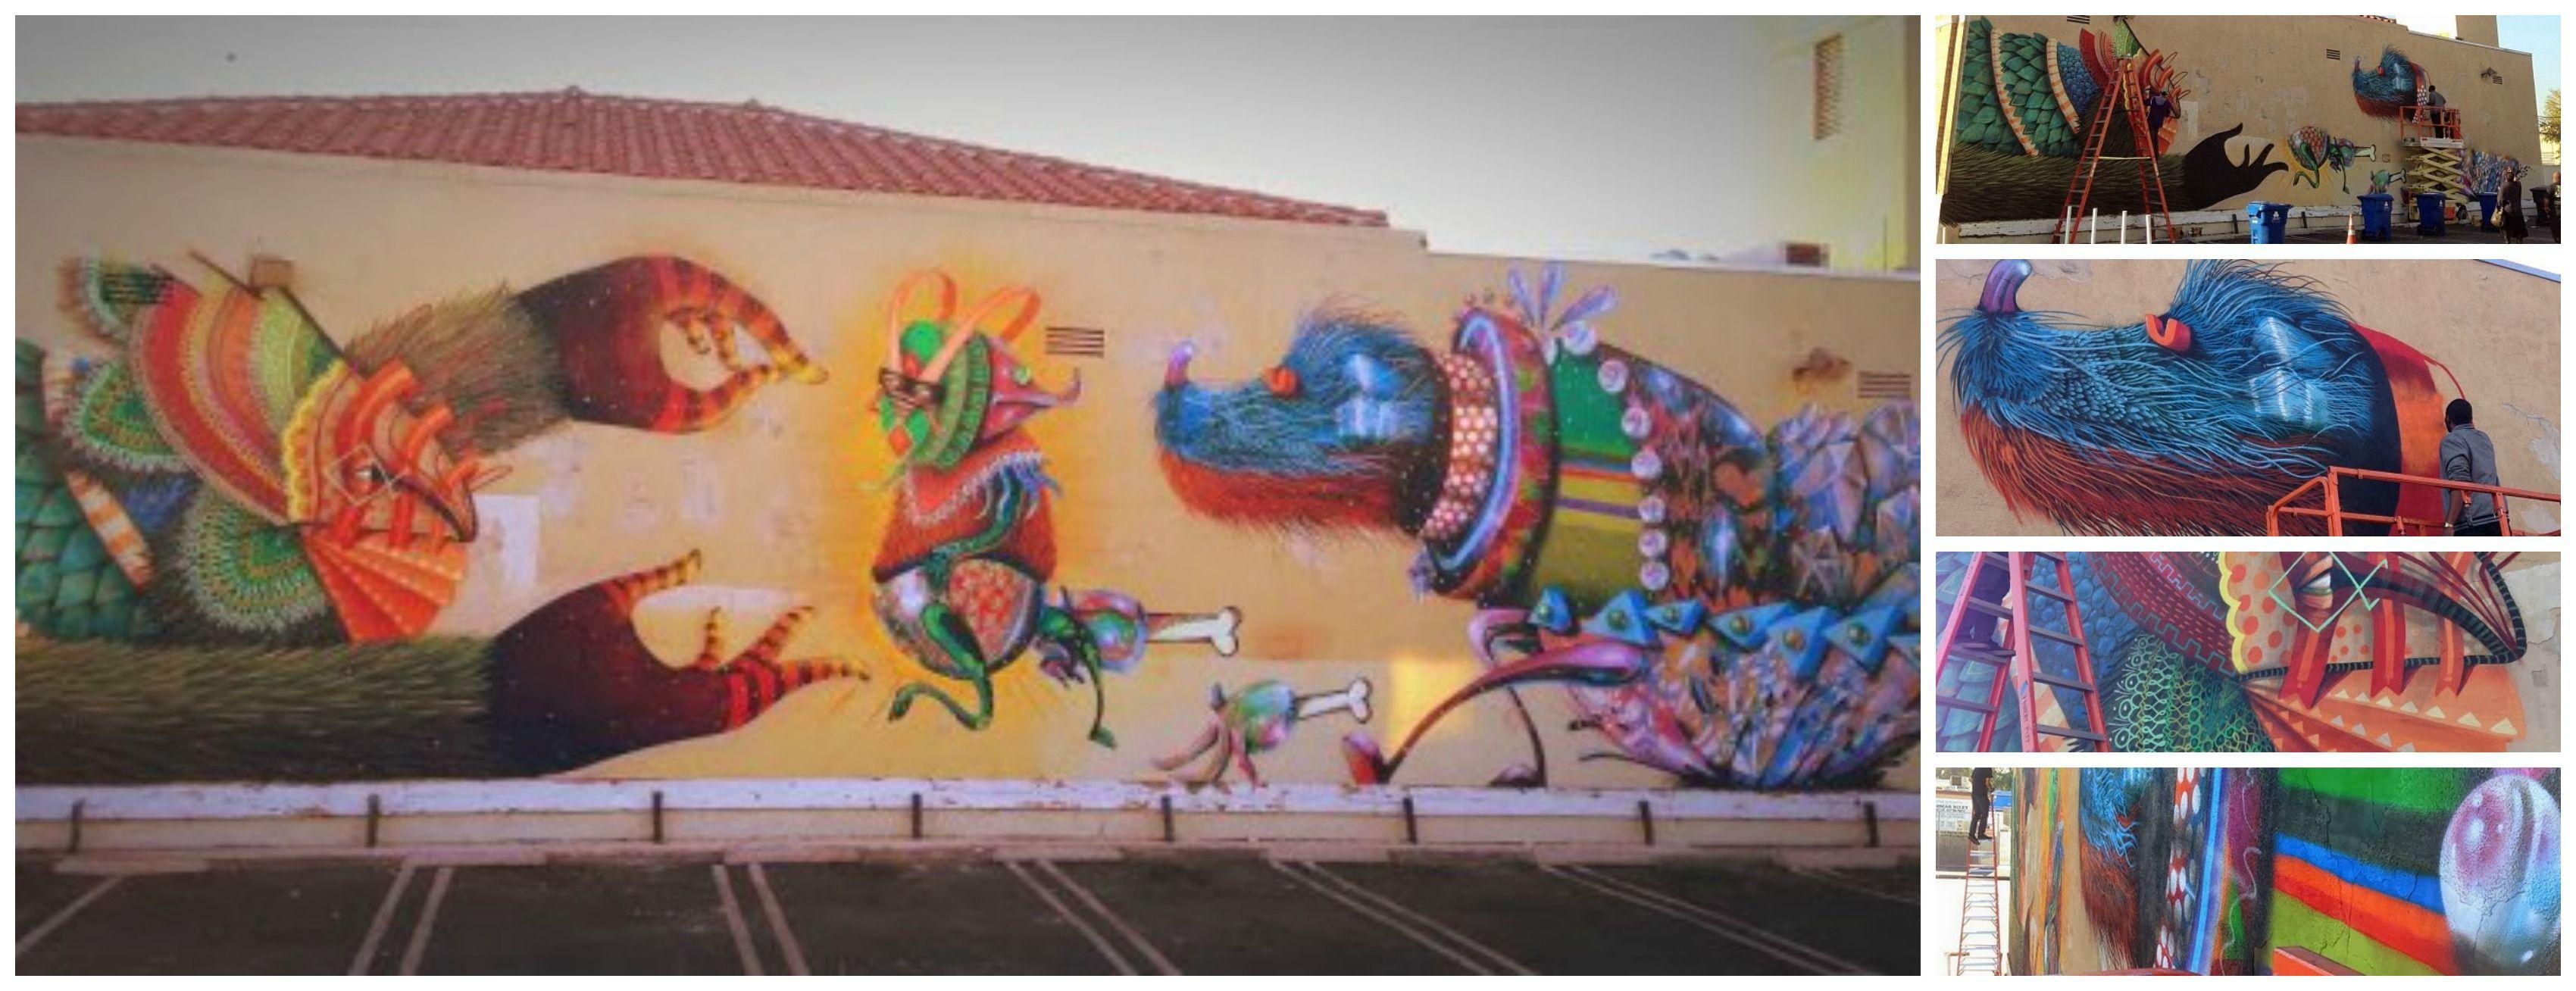 Edgar Saner In Bentonville Arkansas USA SANER - Artist paints incredible seaside murals balanced on surfboard